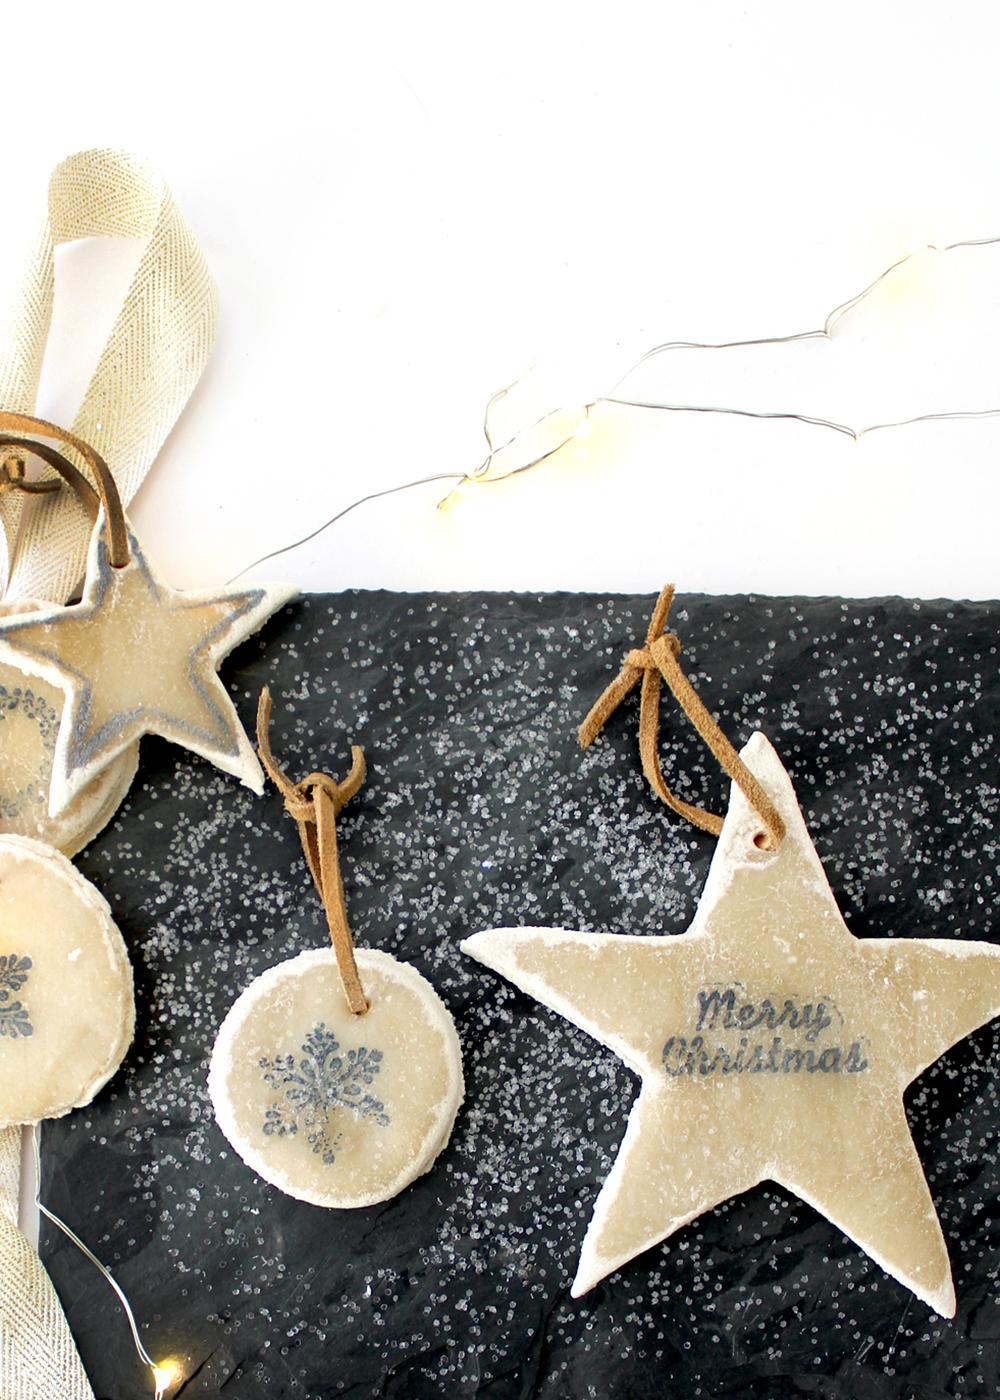 No-Bake Salt Dough Ornaments #holidayDIY #ChristmasOrnaments